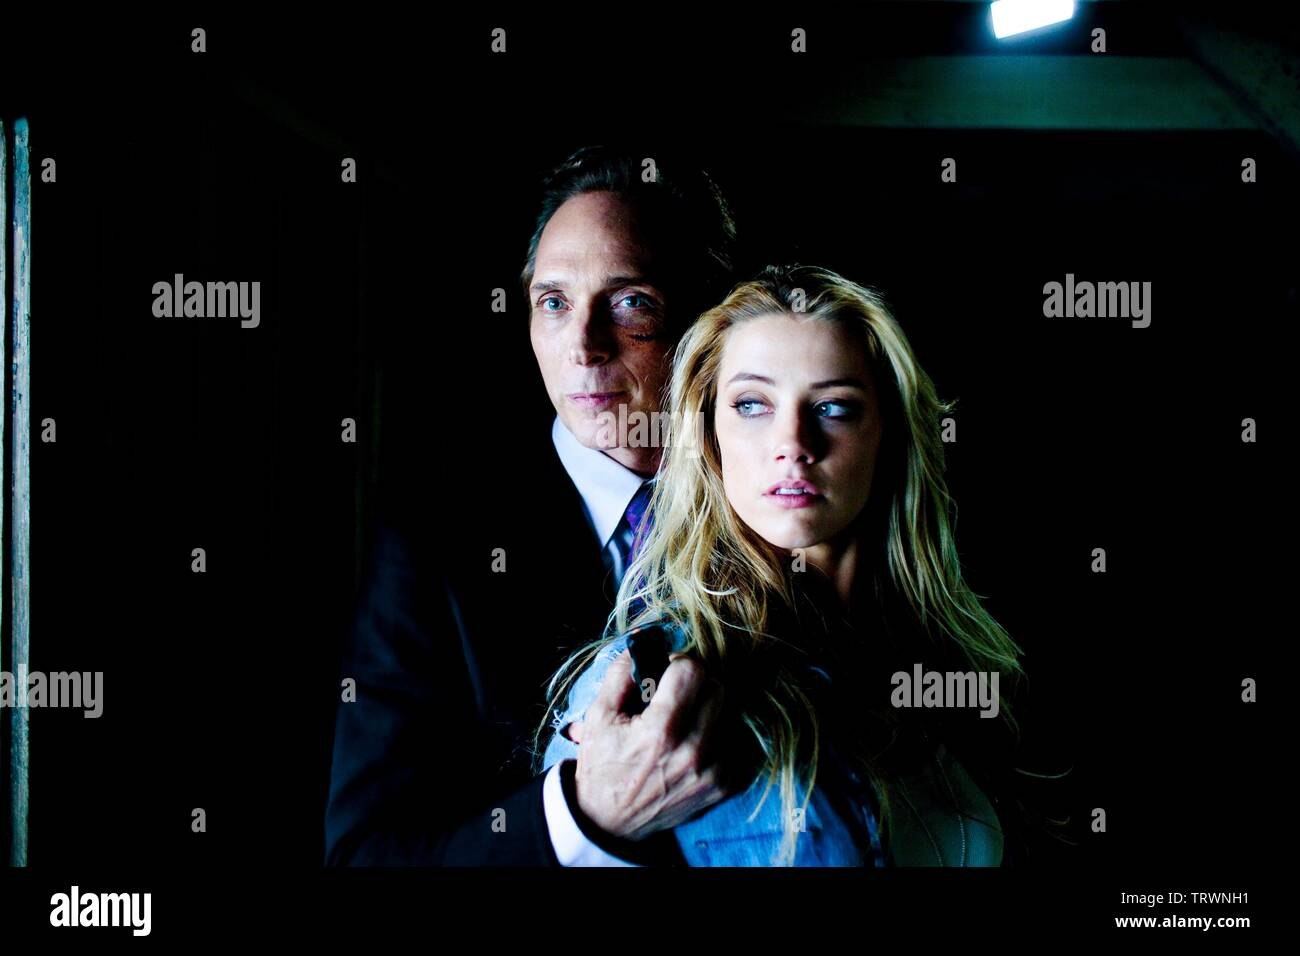 Amber Marie Goetz fichtner stock photos & fichtner stock images - page 3 - alamy